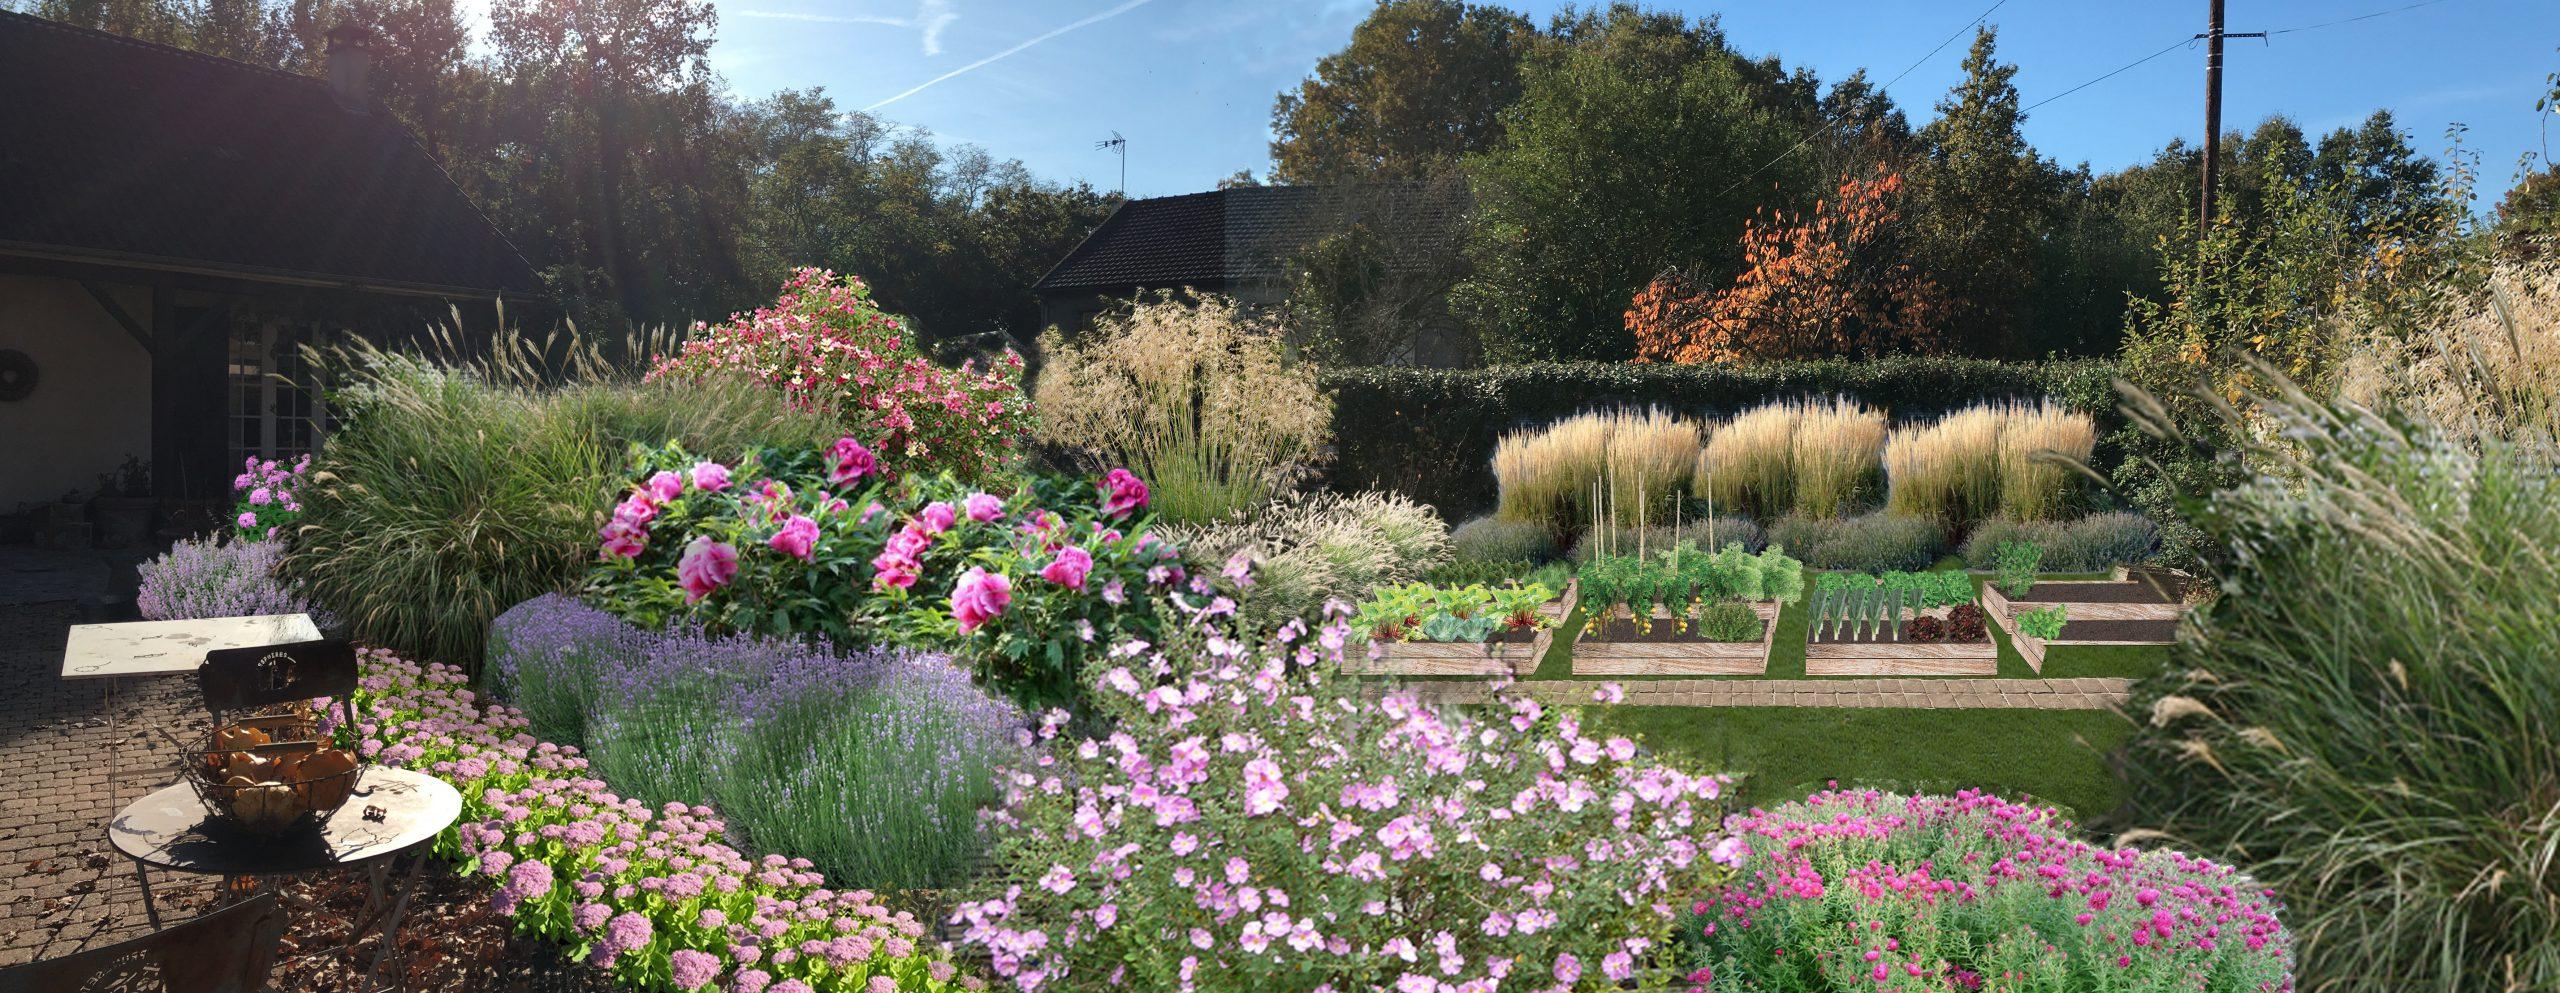 Jardin De Graminees & Vivaces, Eragny-Sur-Oise (95) | Sophie ... dedans Piscine Eragny